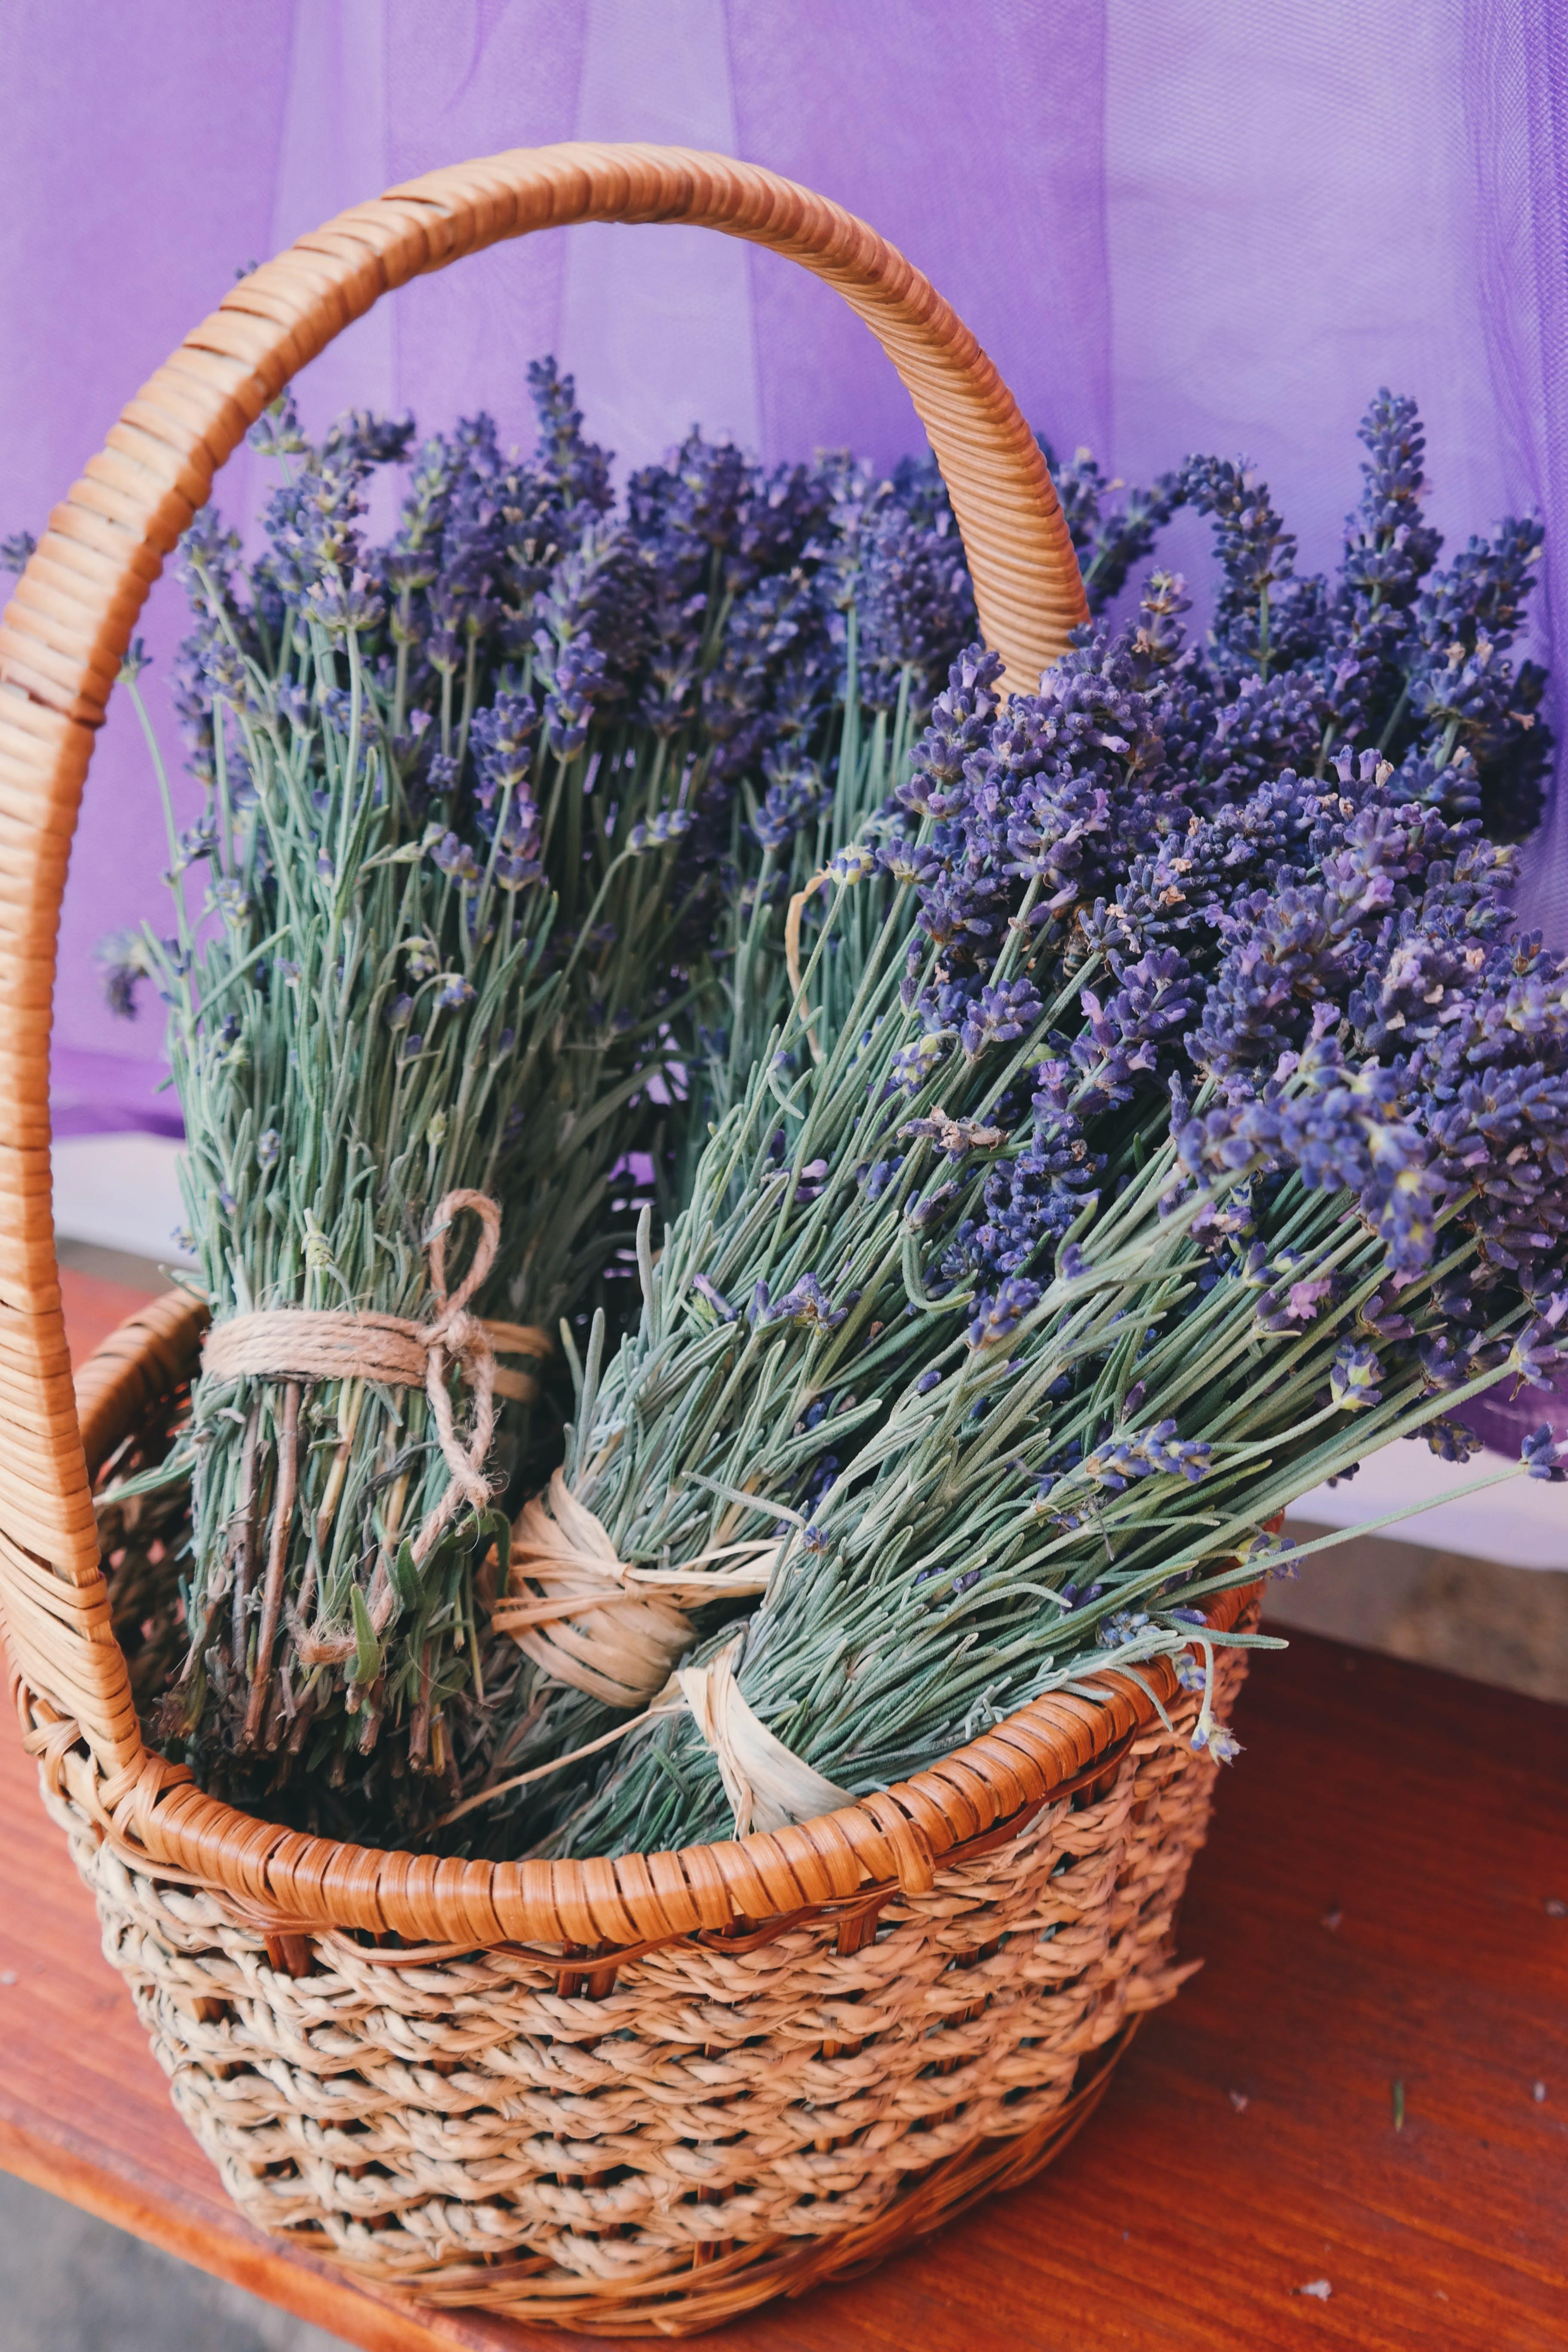 Lavender Flowers in Woven Basket